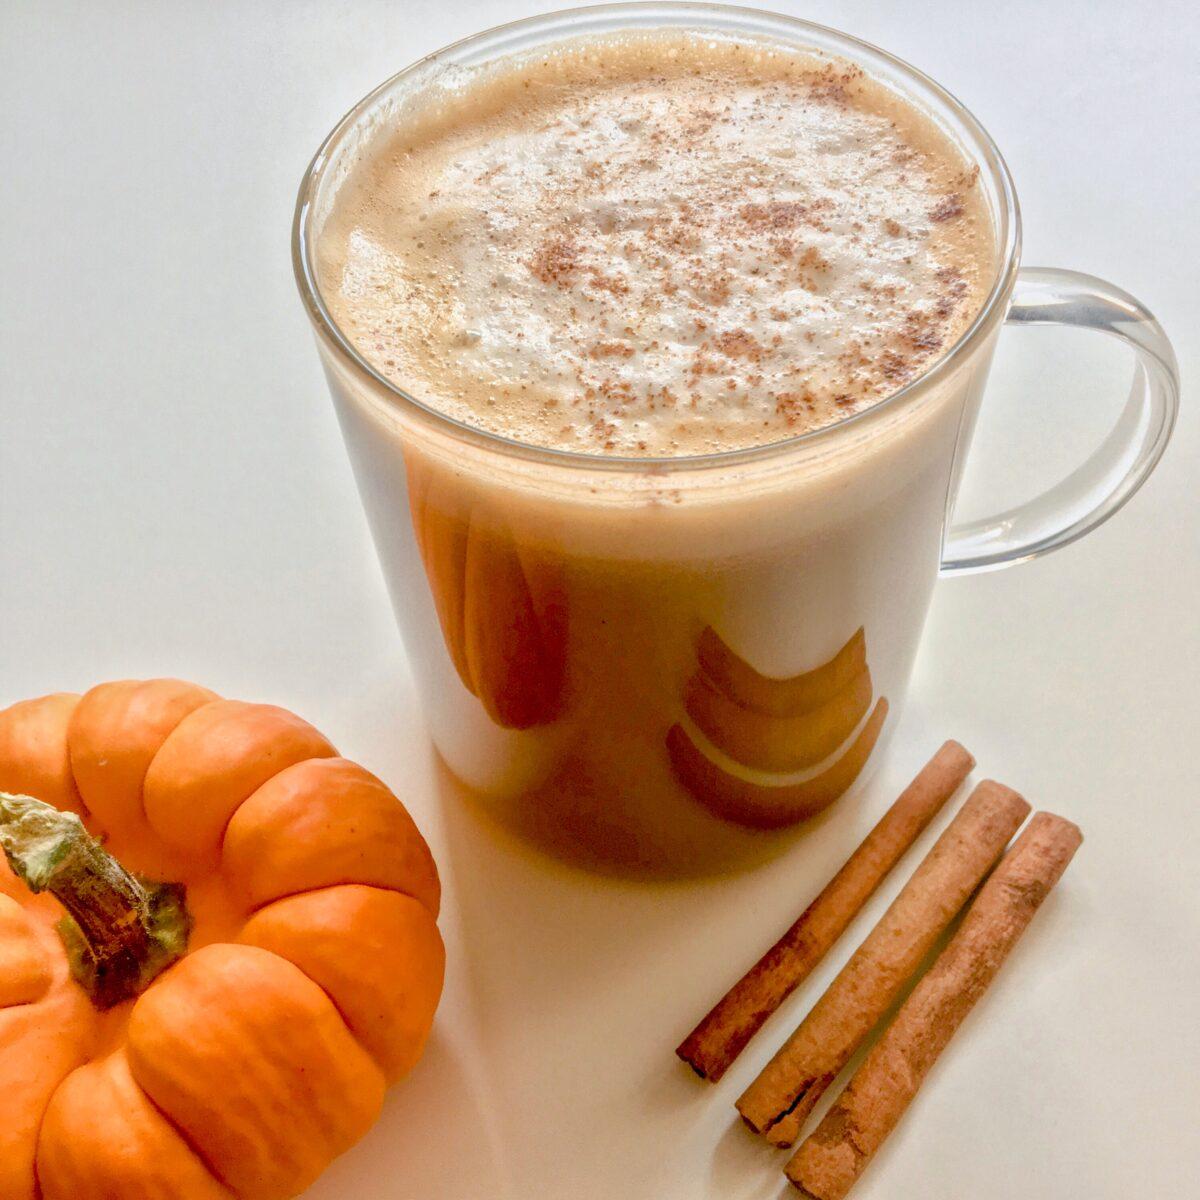 The Urben Life Pumpkin Spice Latte